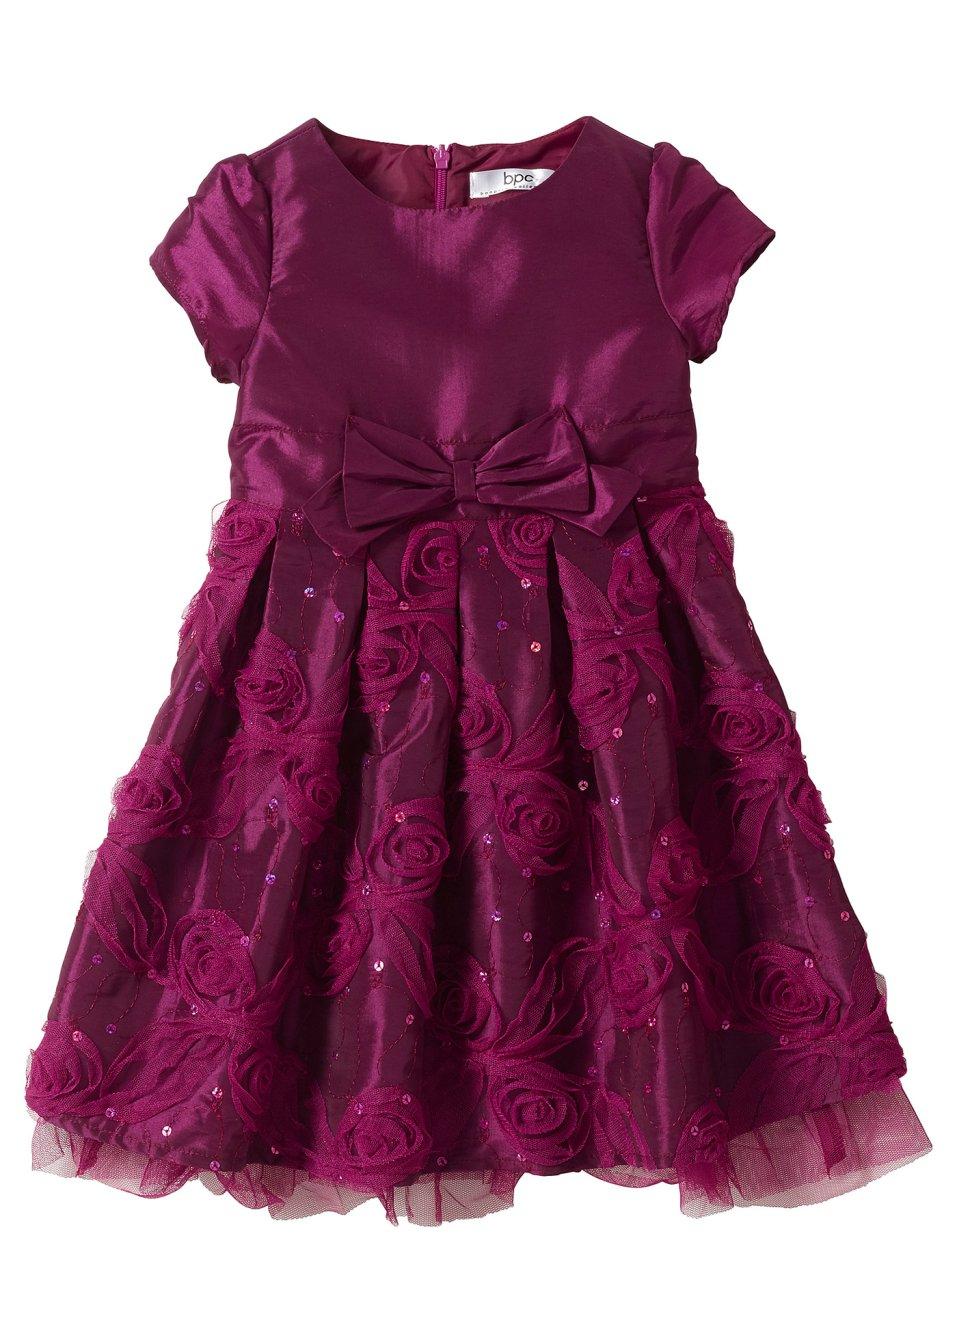 robe prune bpc bonprix collection commande online. Black Bedroom Furniture Sets. Home Design Ideas